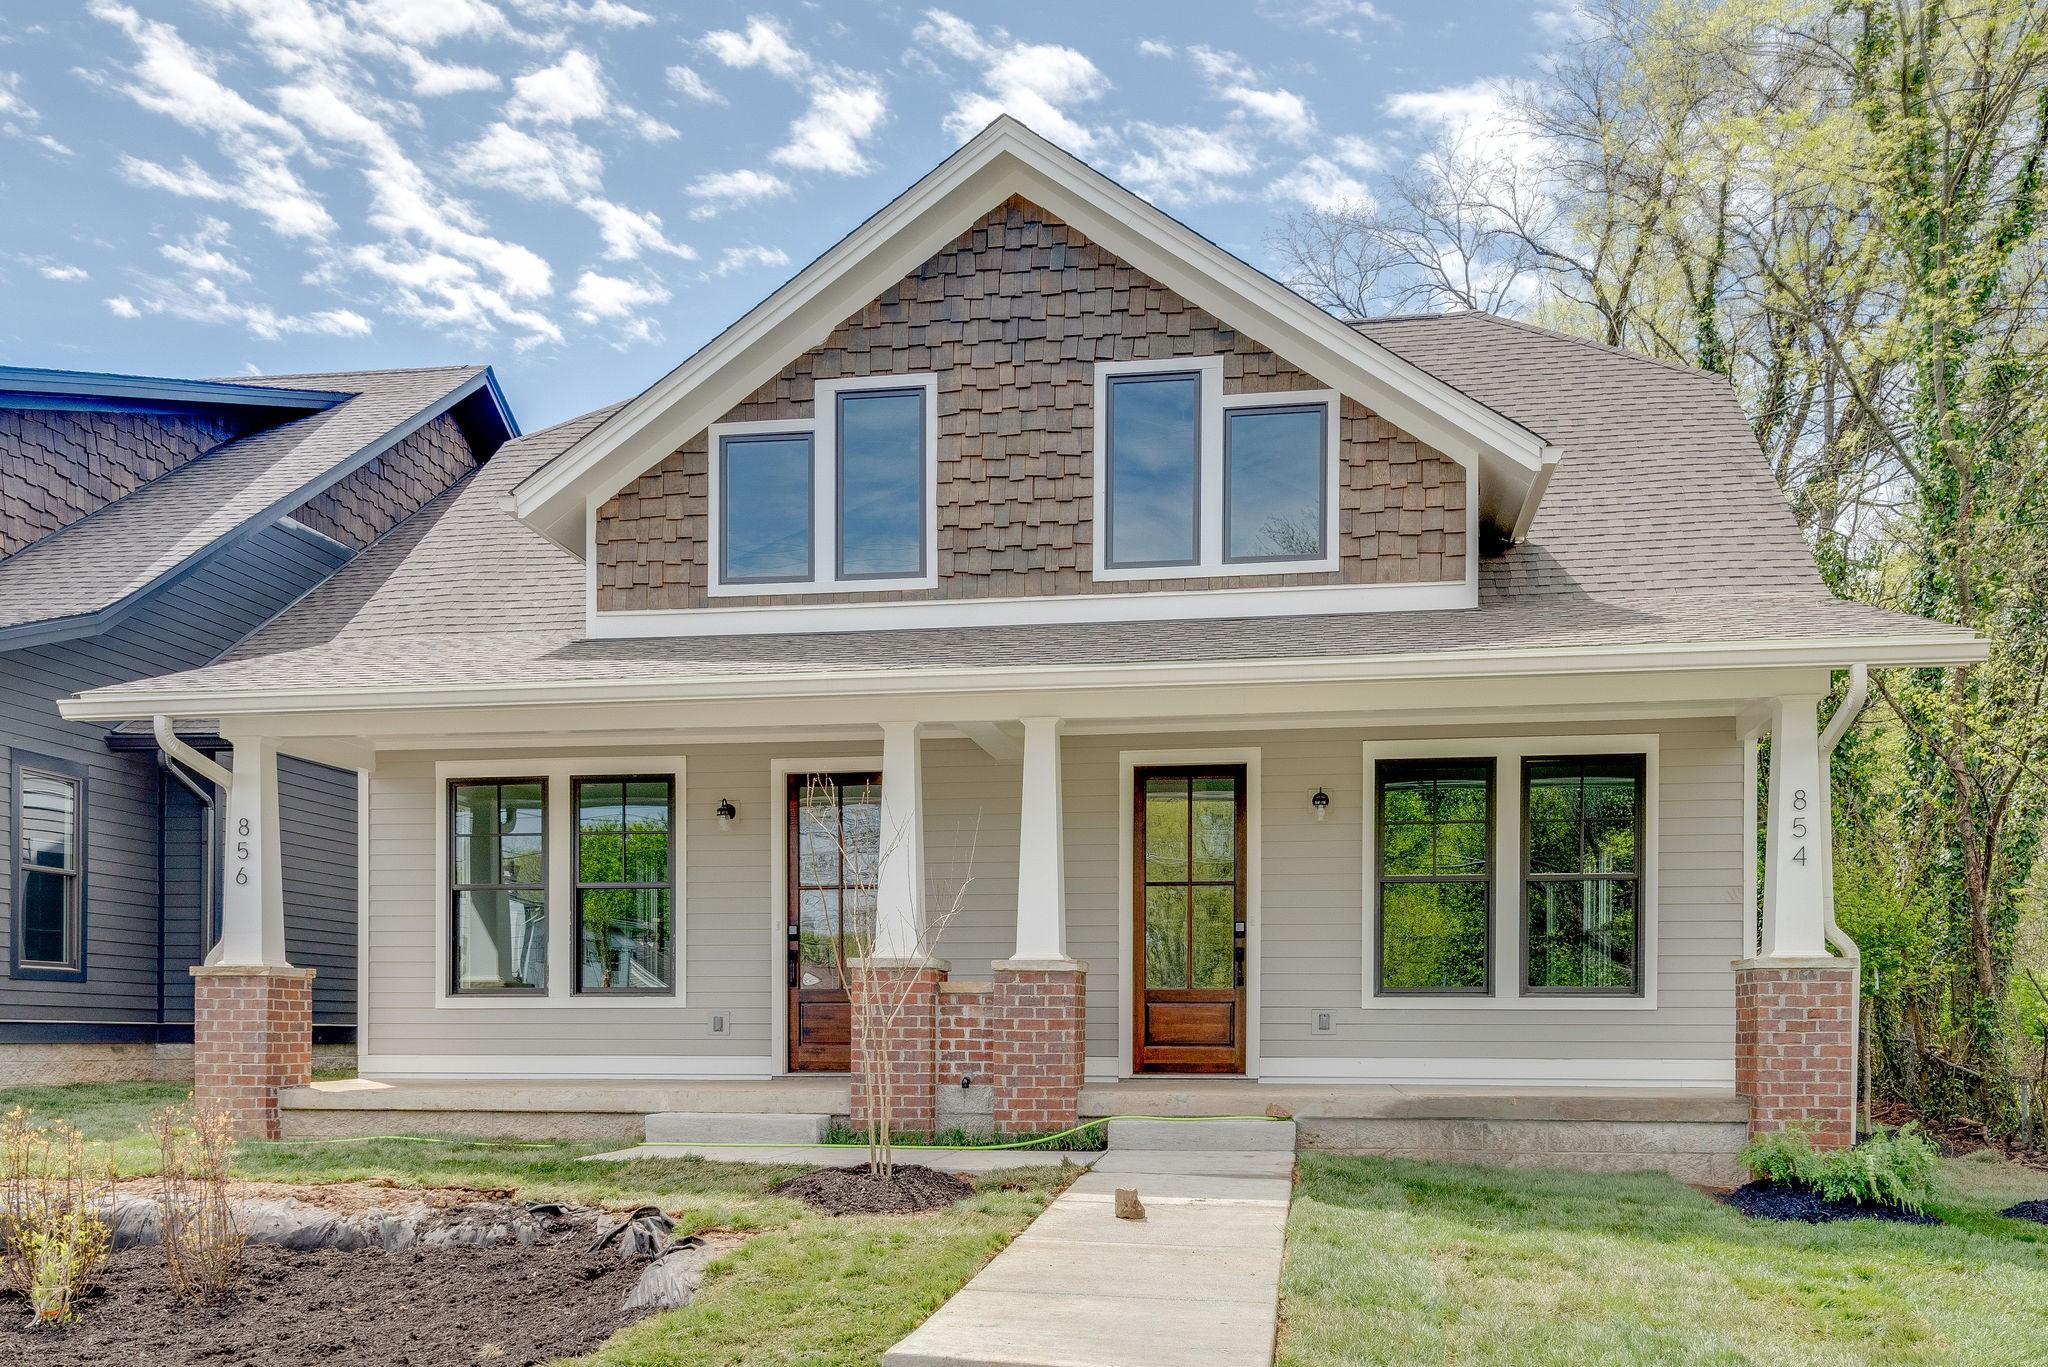 854 Seymour Ave, Nashville, TN 37206 - Nashville, TN real estate listing